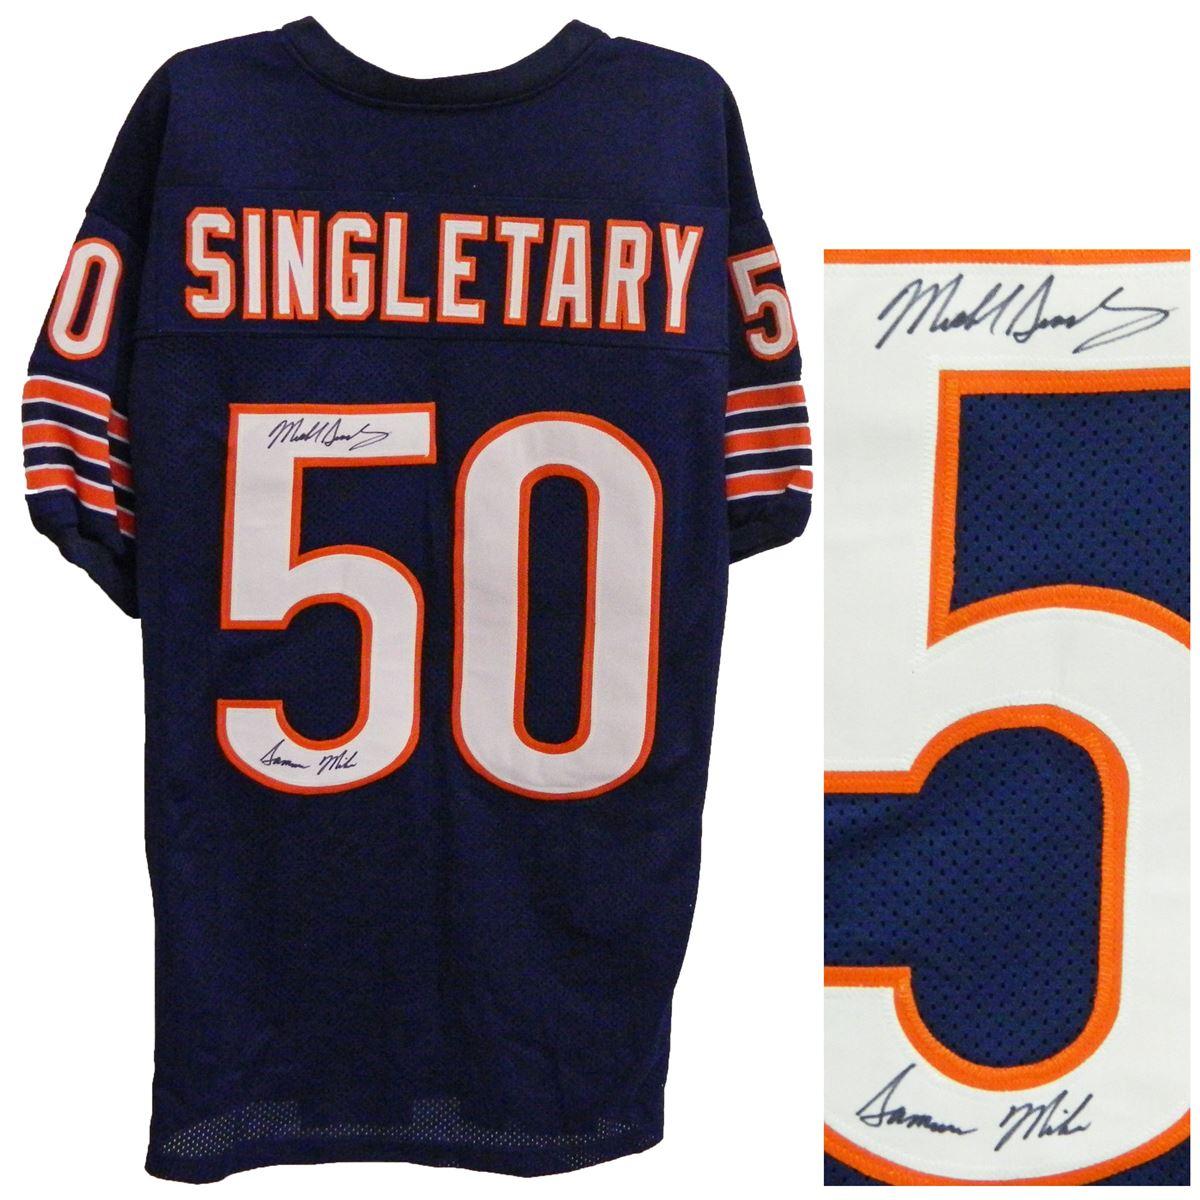 premium selection 54601 38bbc Mike Singletary Signed Navy Custom Throwback Jersey W/Samurai Mike